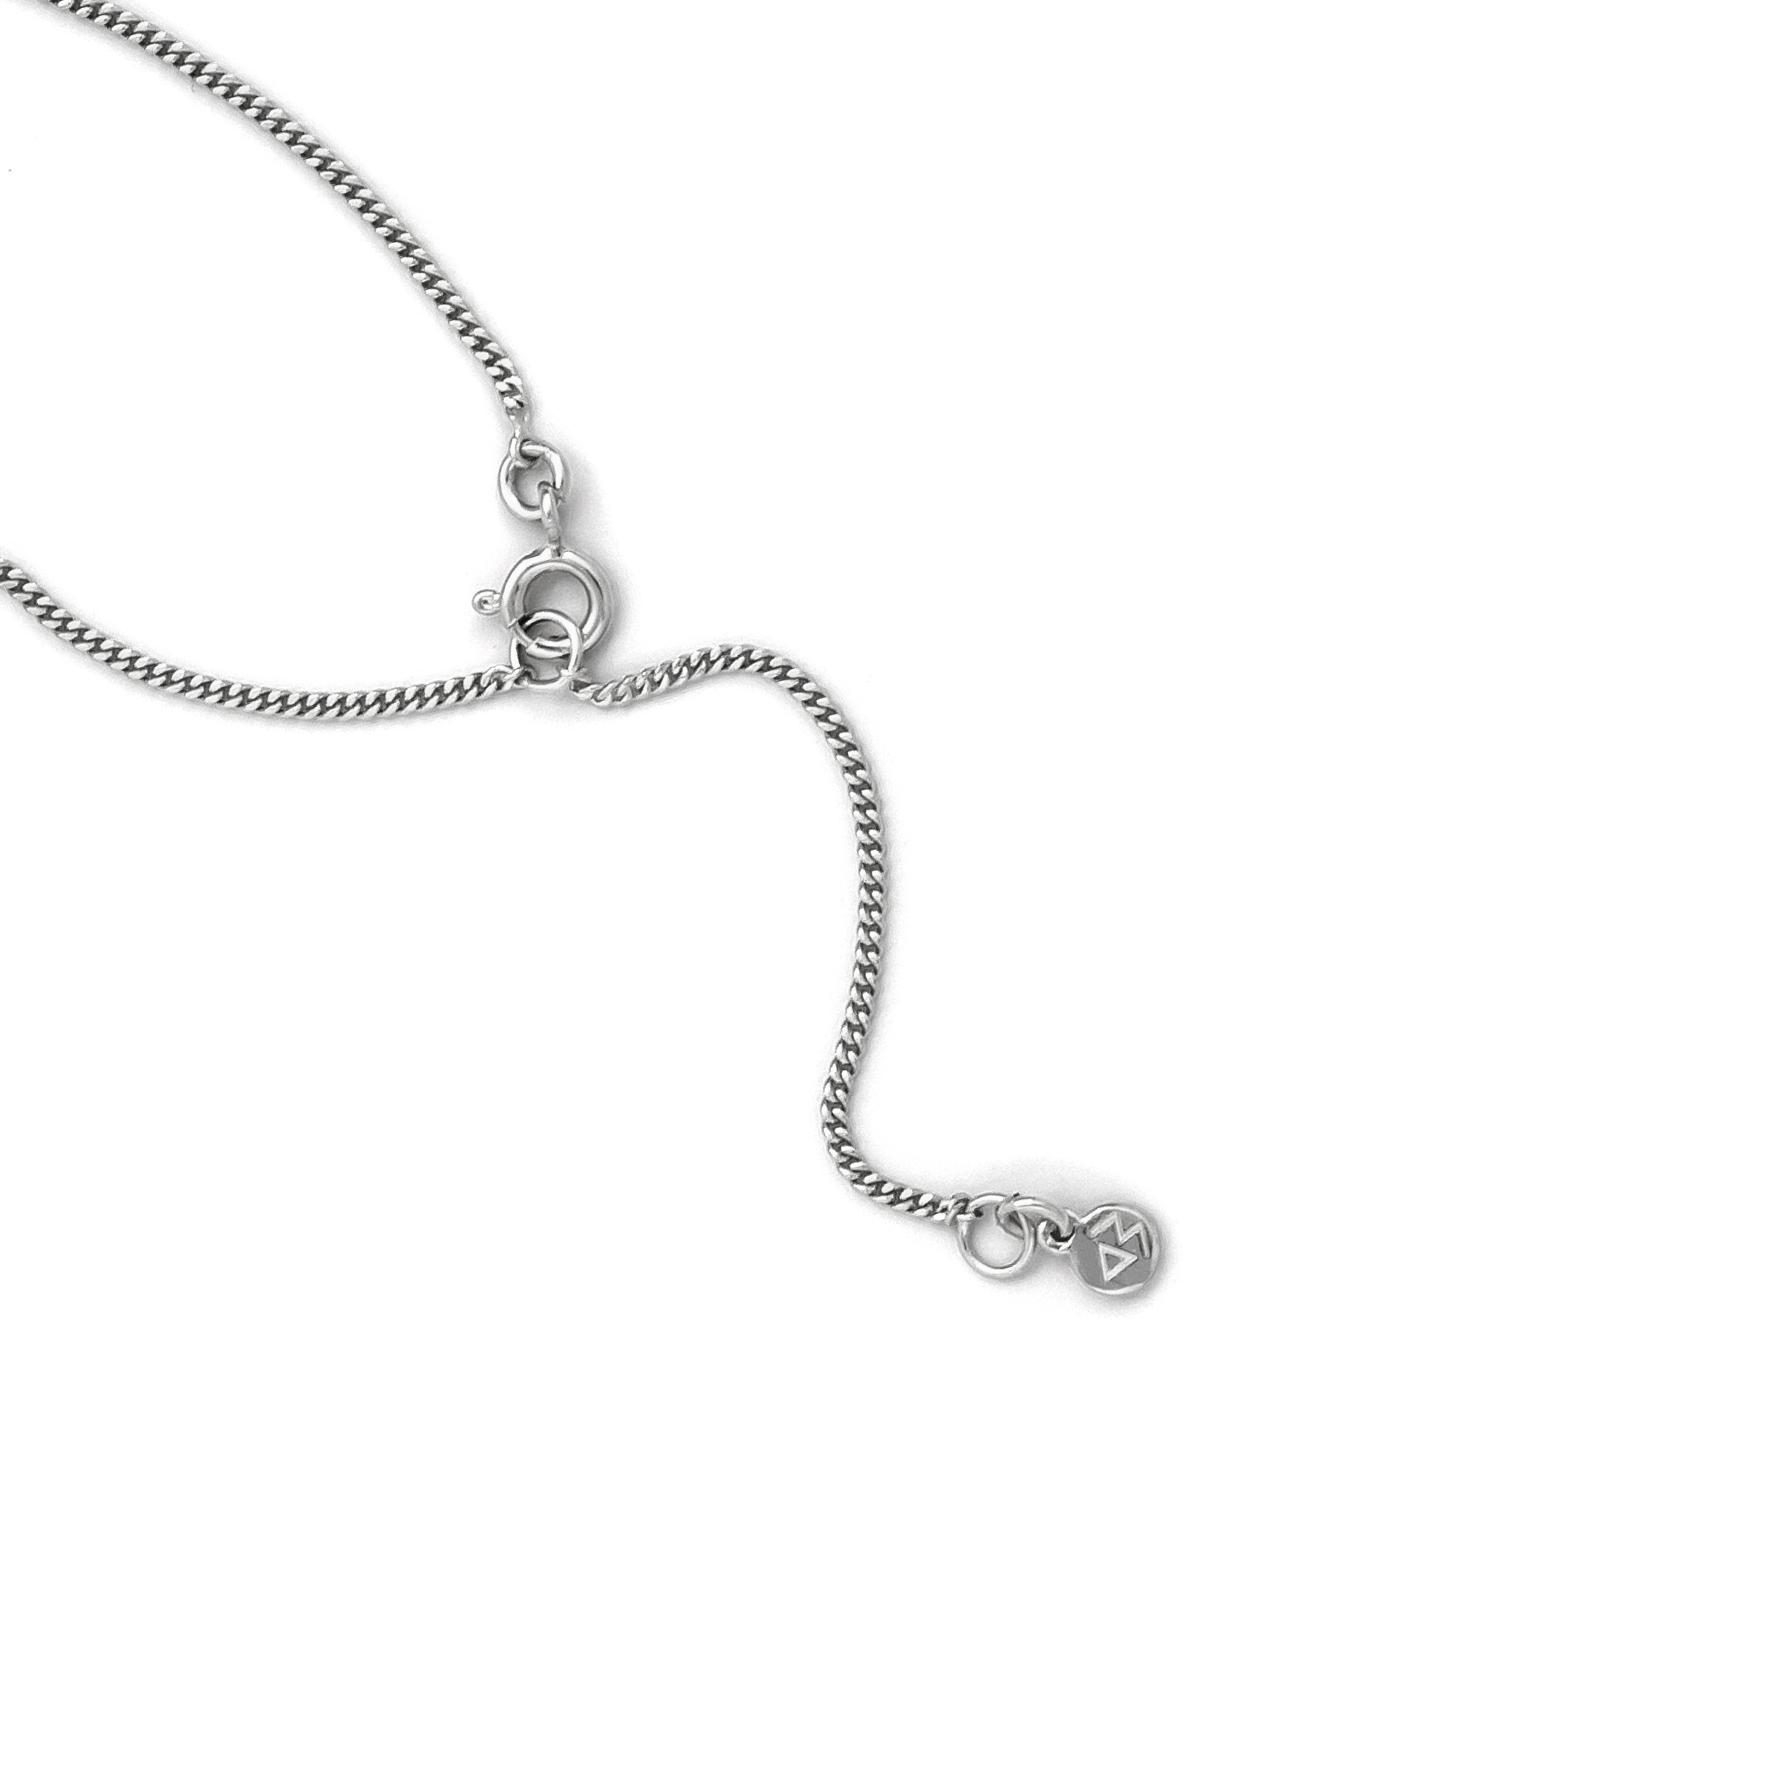 Orbital Necklace